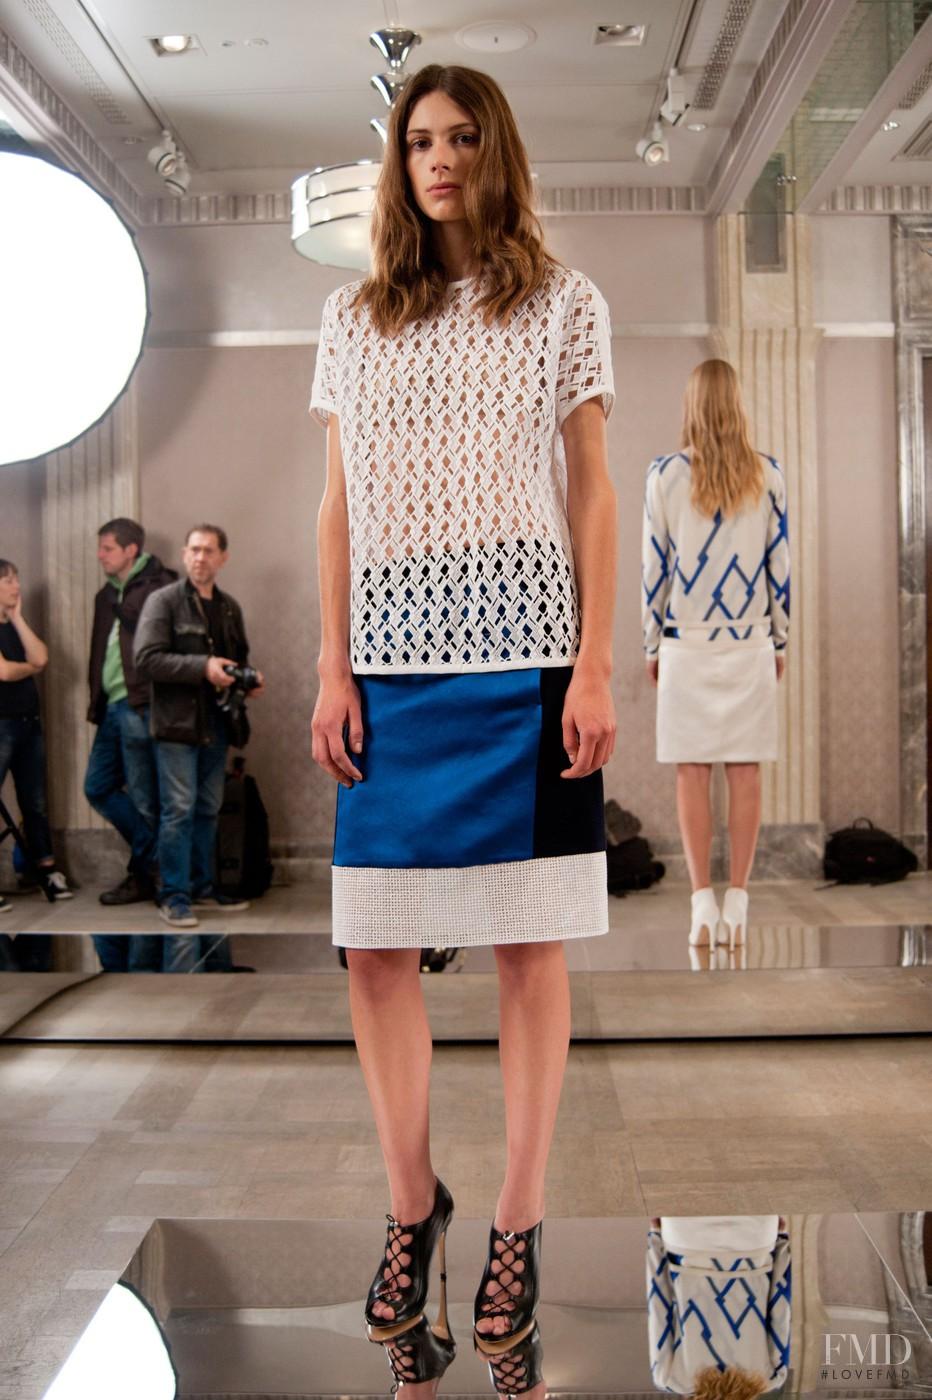 London Fashion Week - Pringle of Scotland 74